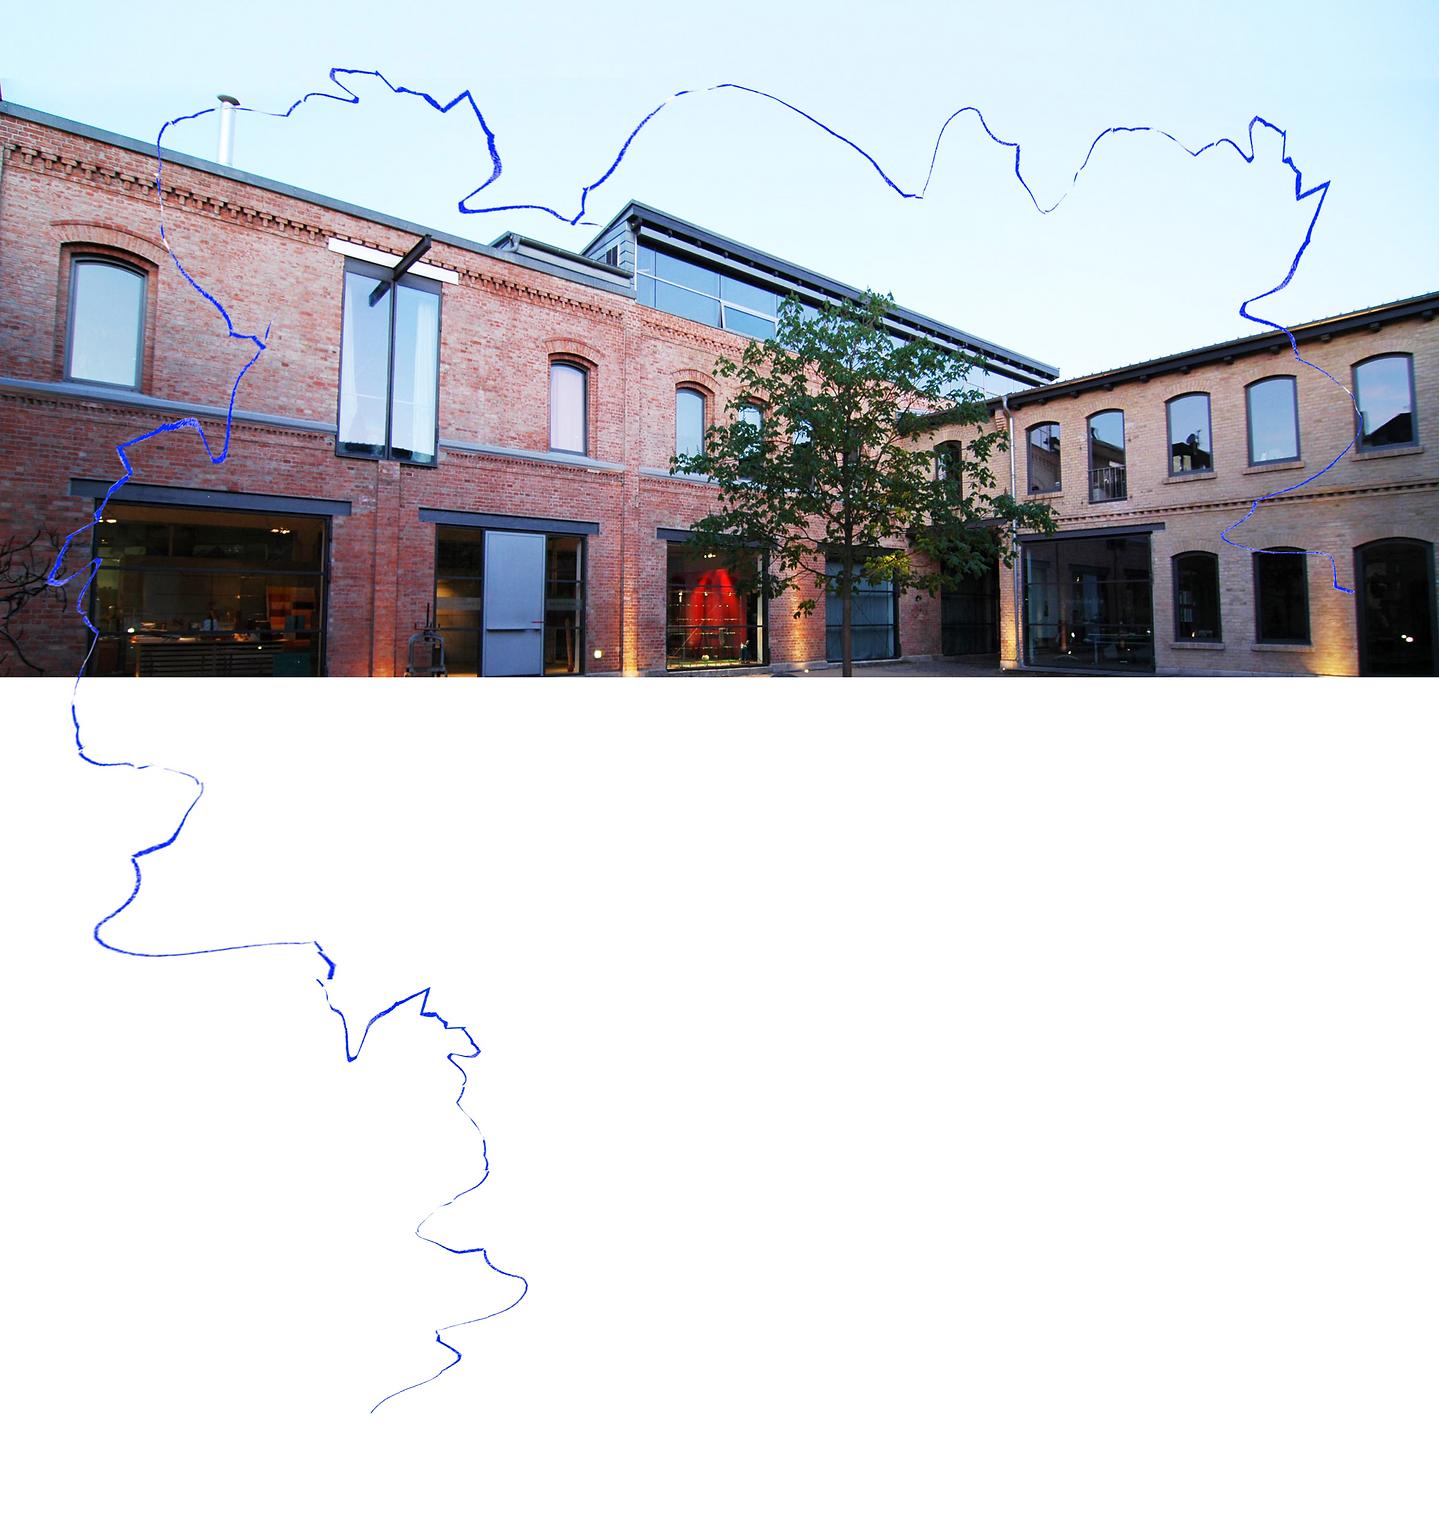 telblatt neu blau kastanienhof.png